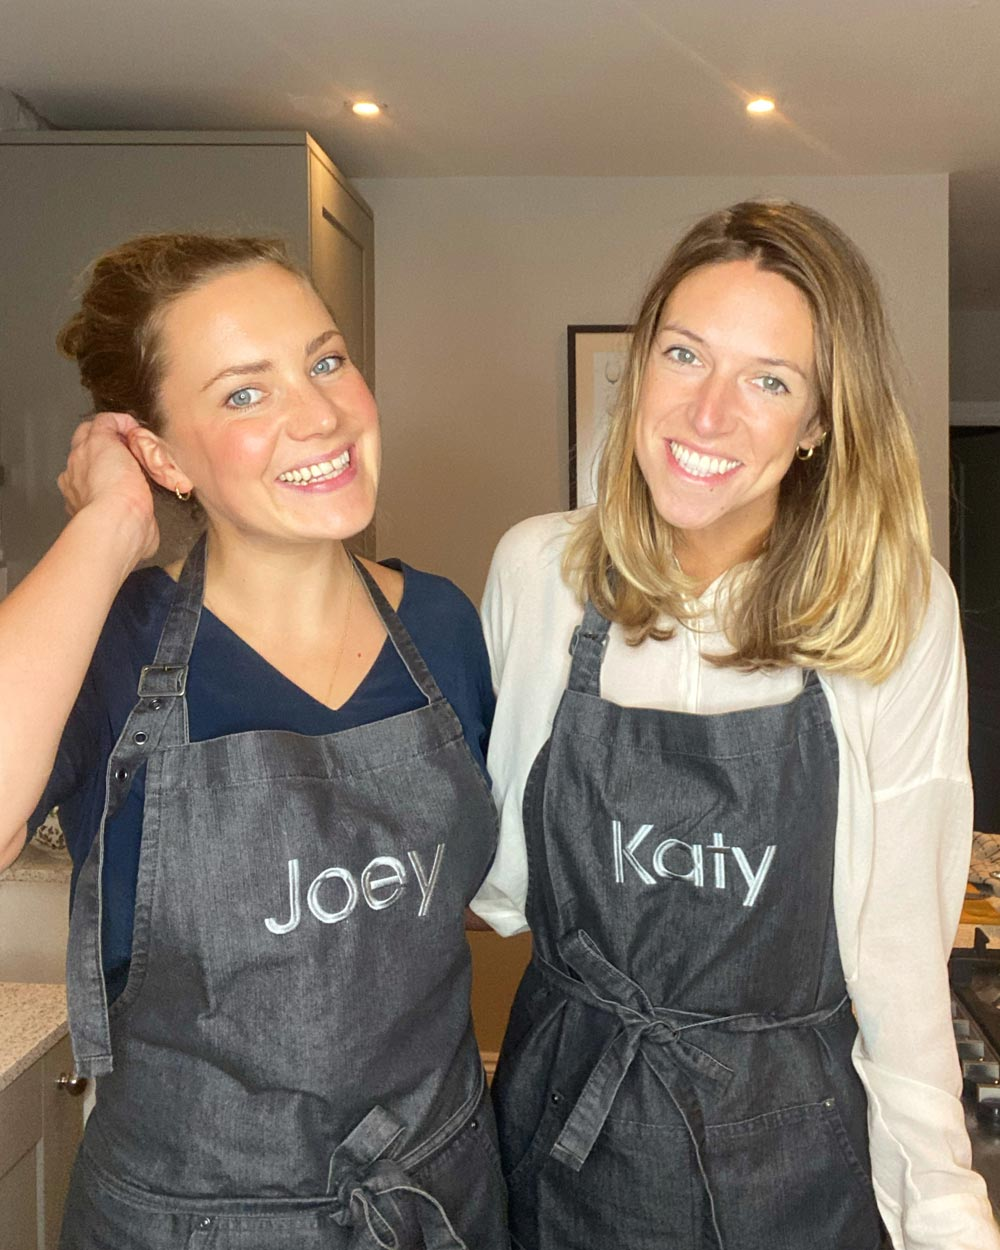 joey-and-katy-1-1